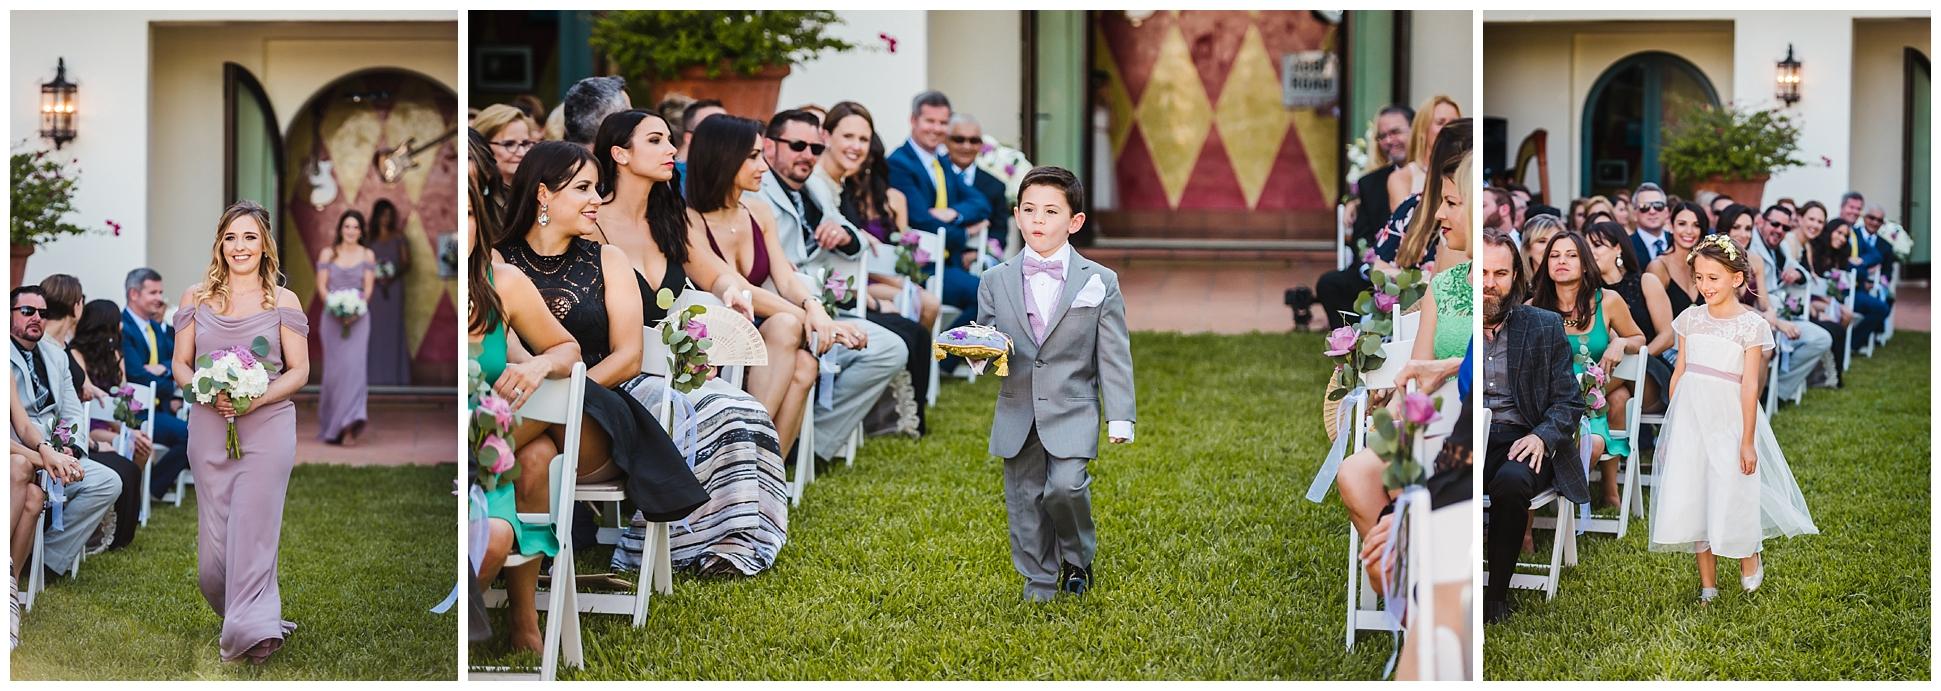 Tampa-luxury-wedding-photographer-mision-lago-private-estate_0025.jpg